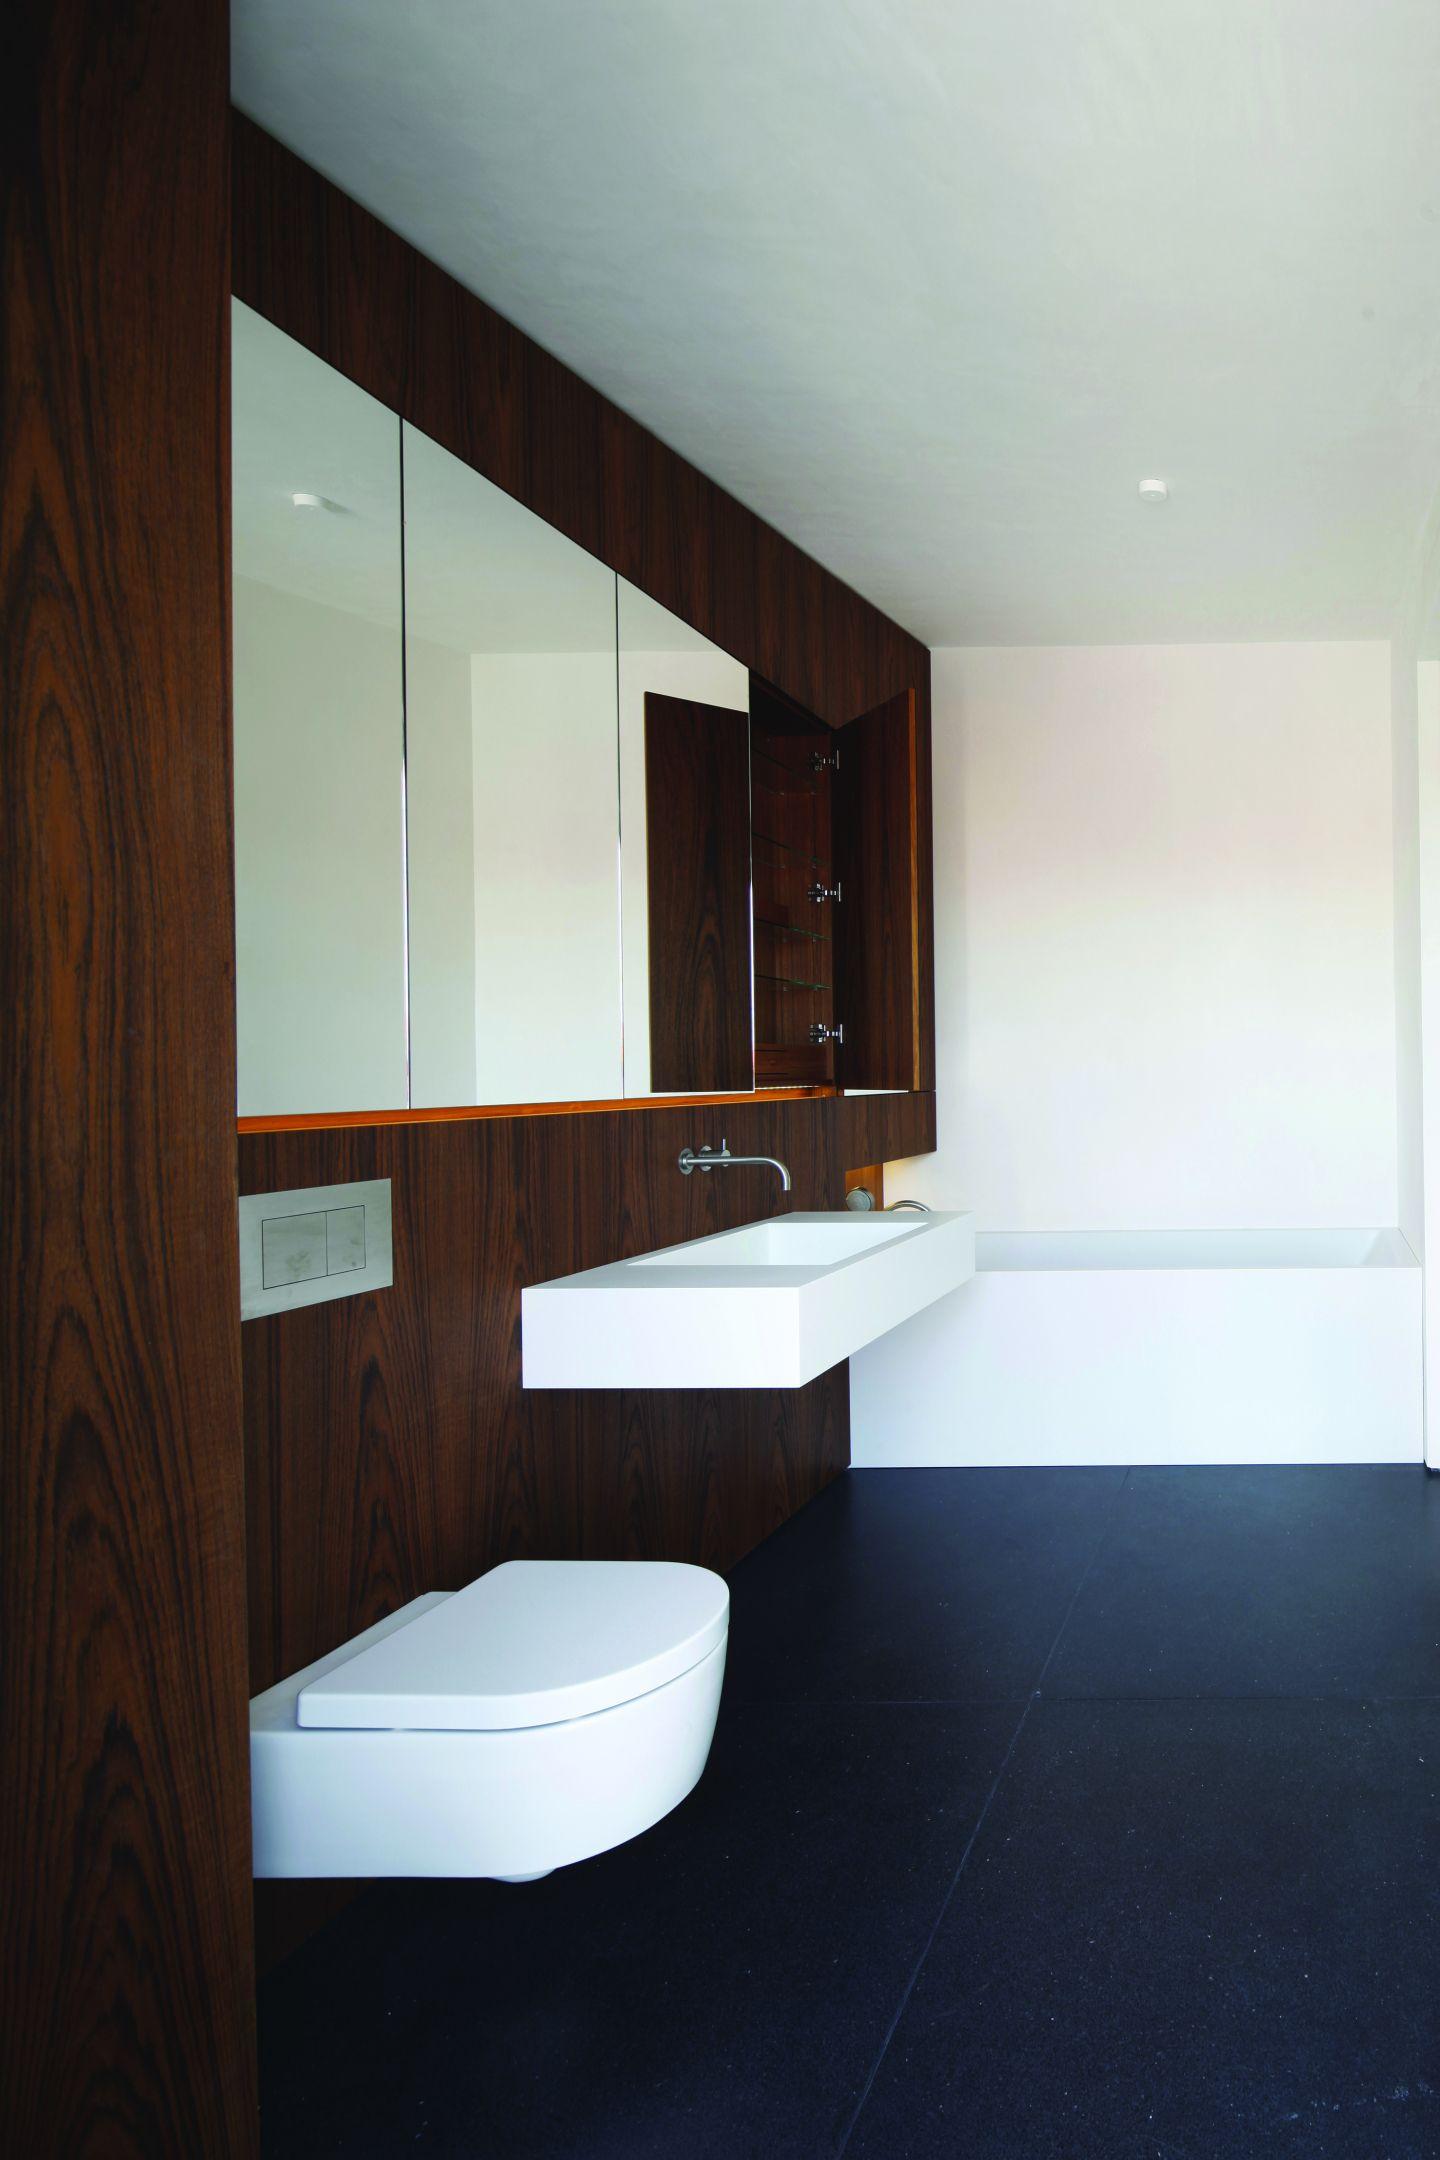 holz statt fliesen. Black Bedroom Furniture Sets. Home Design Ideas